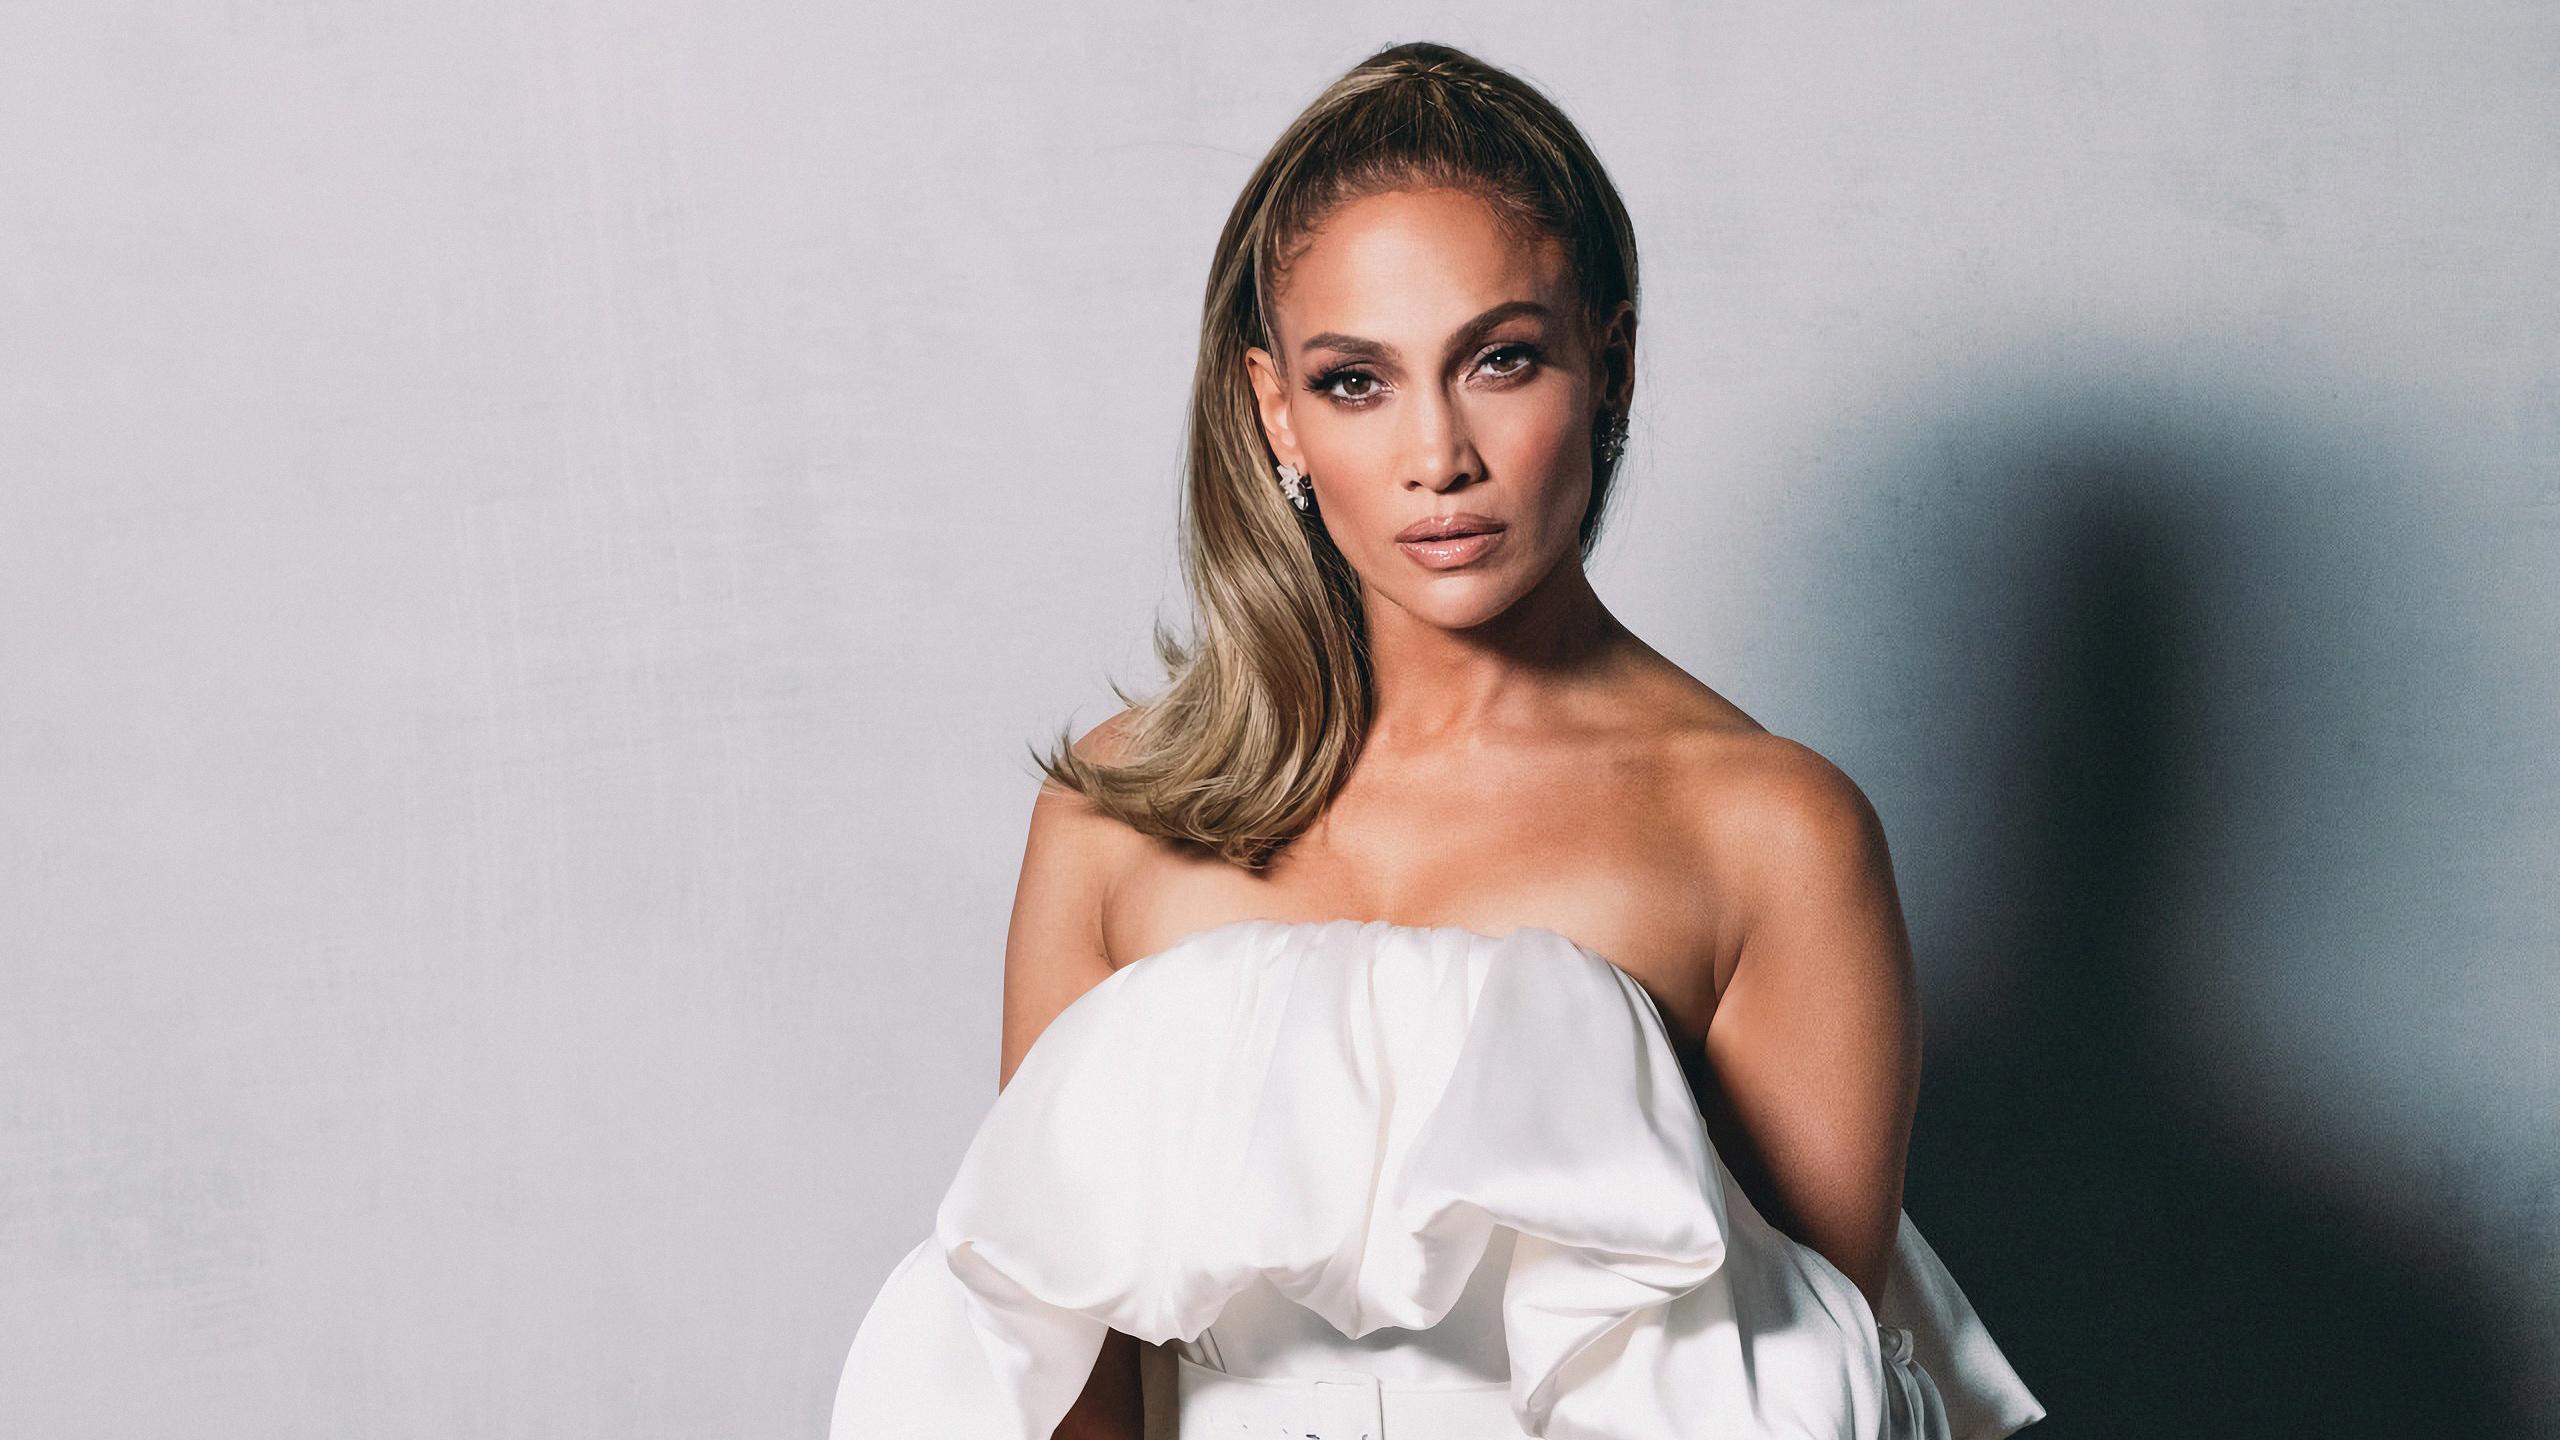 Jennifer Lopez Variety 2019 Hd Celebrities 4k Wallpapers